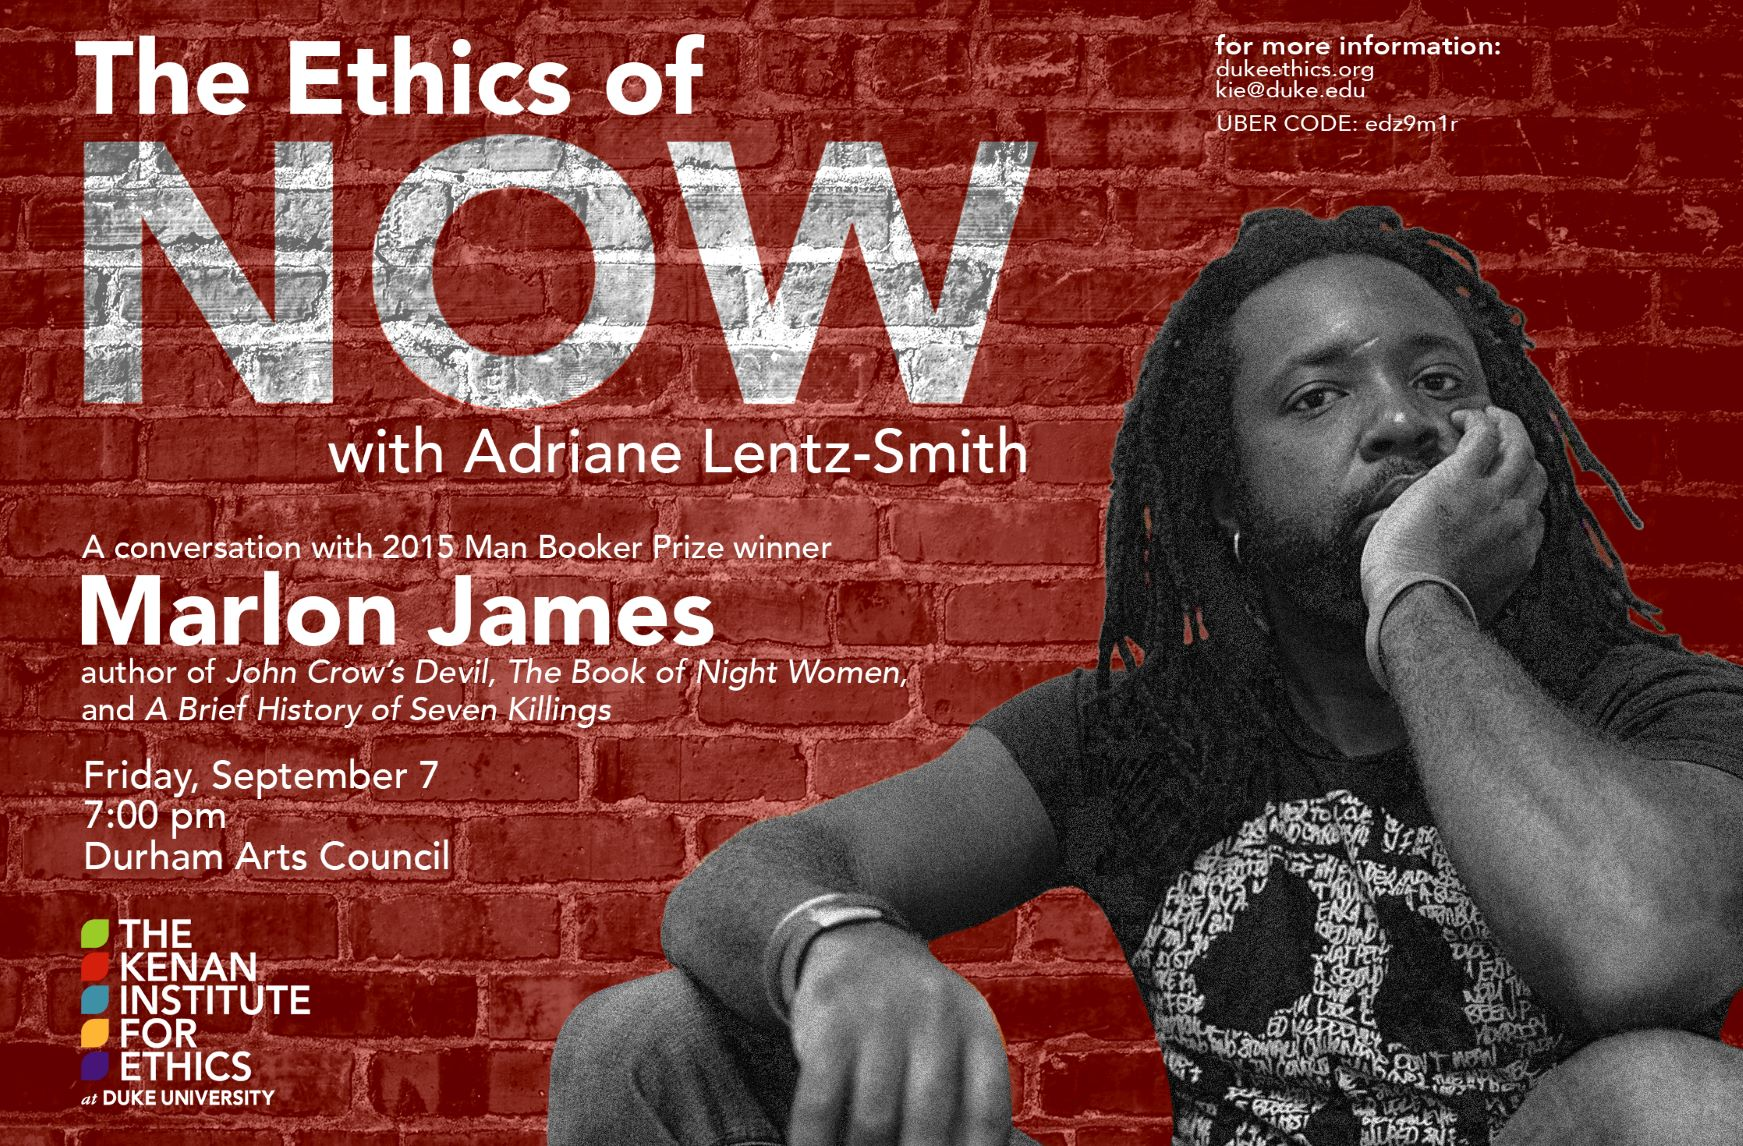 ethics of now Marlon James 3_cf